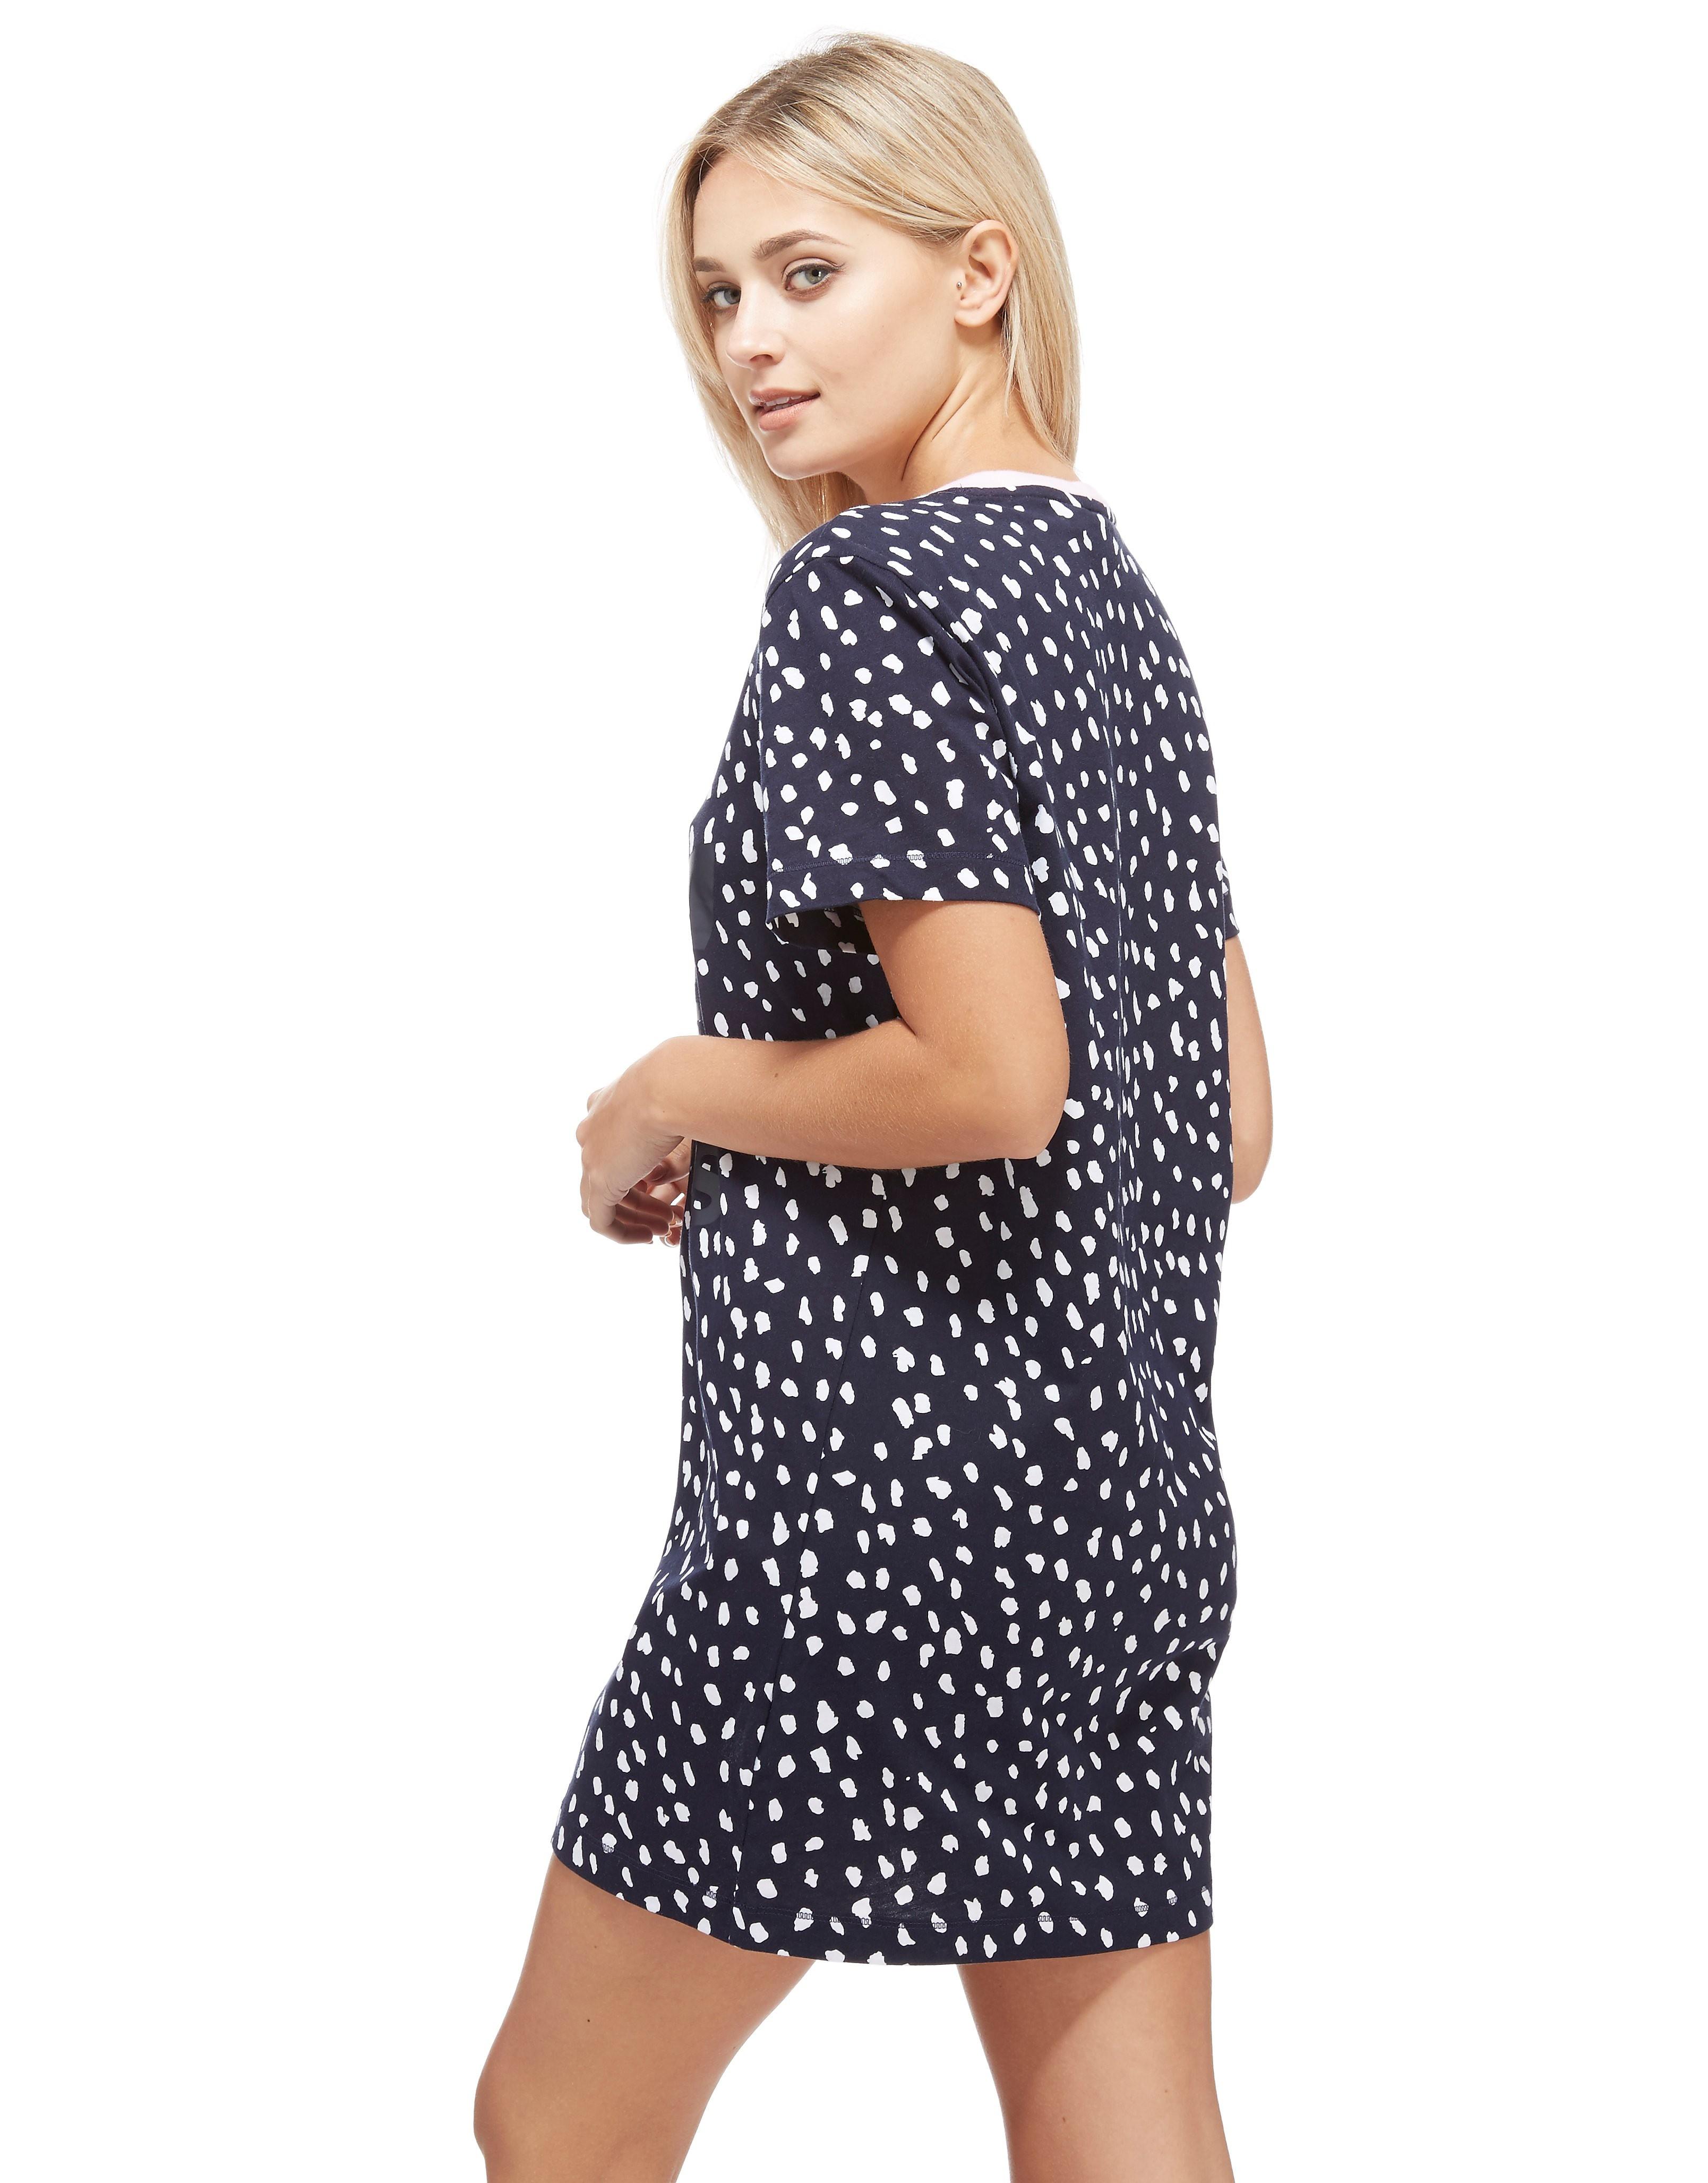 adidas Originals Print T-shirt dress